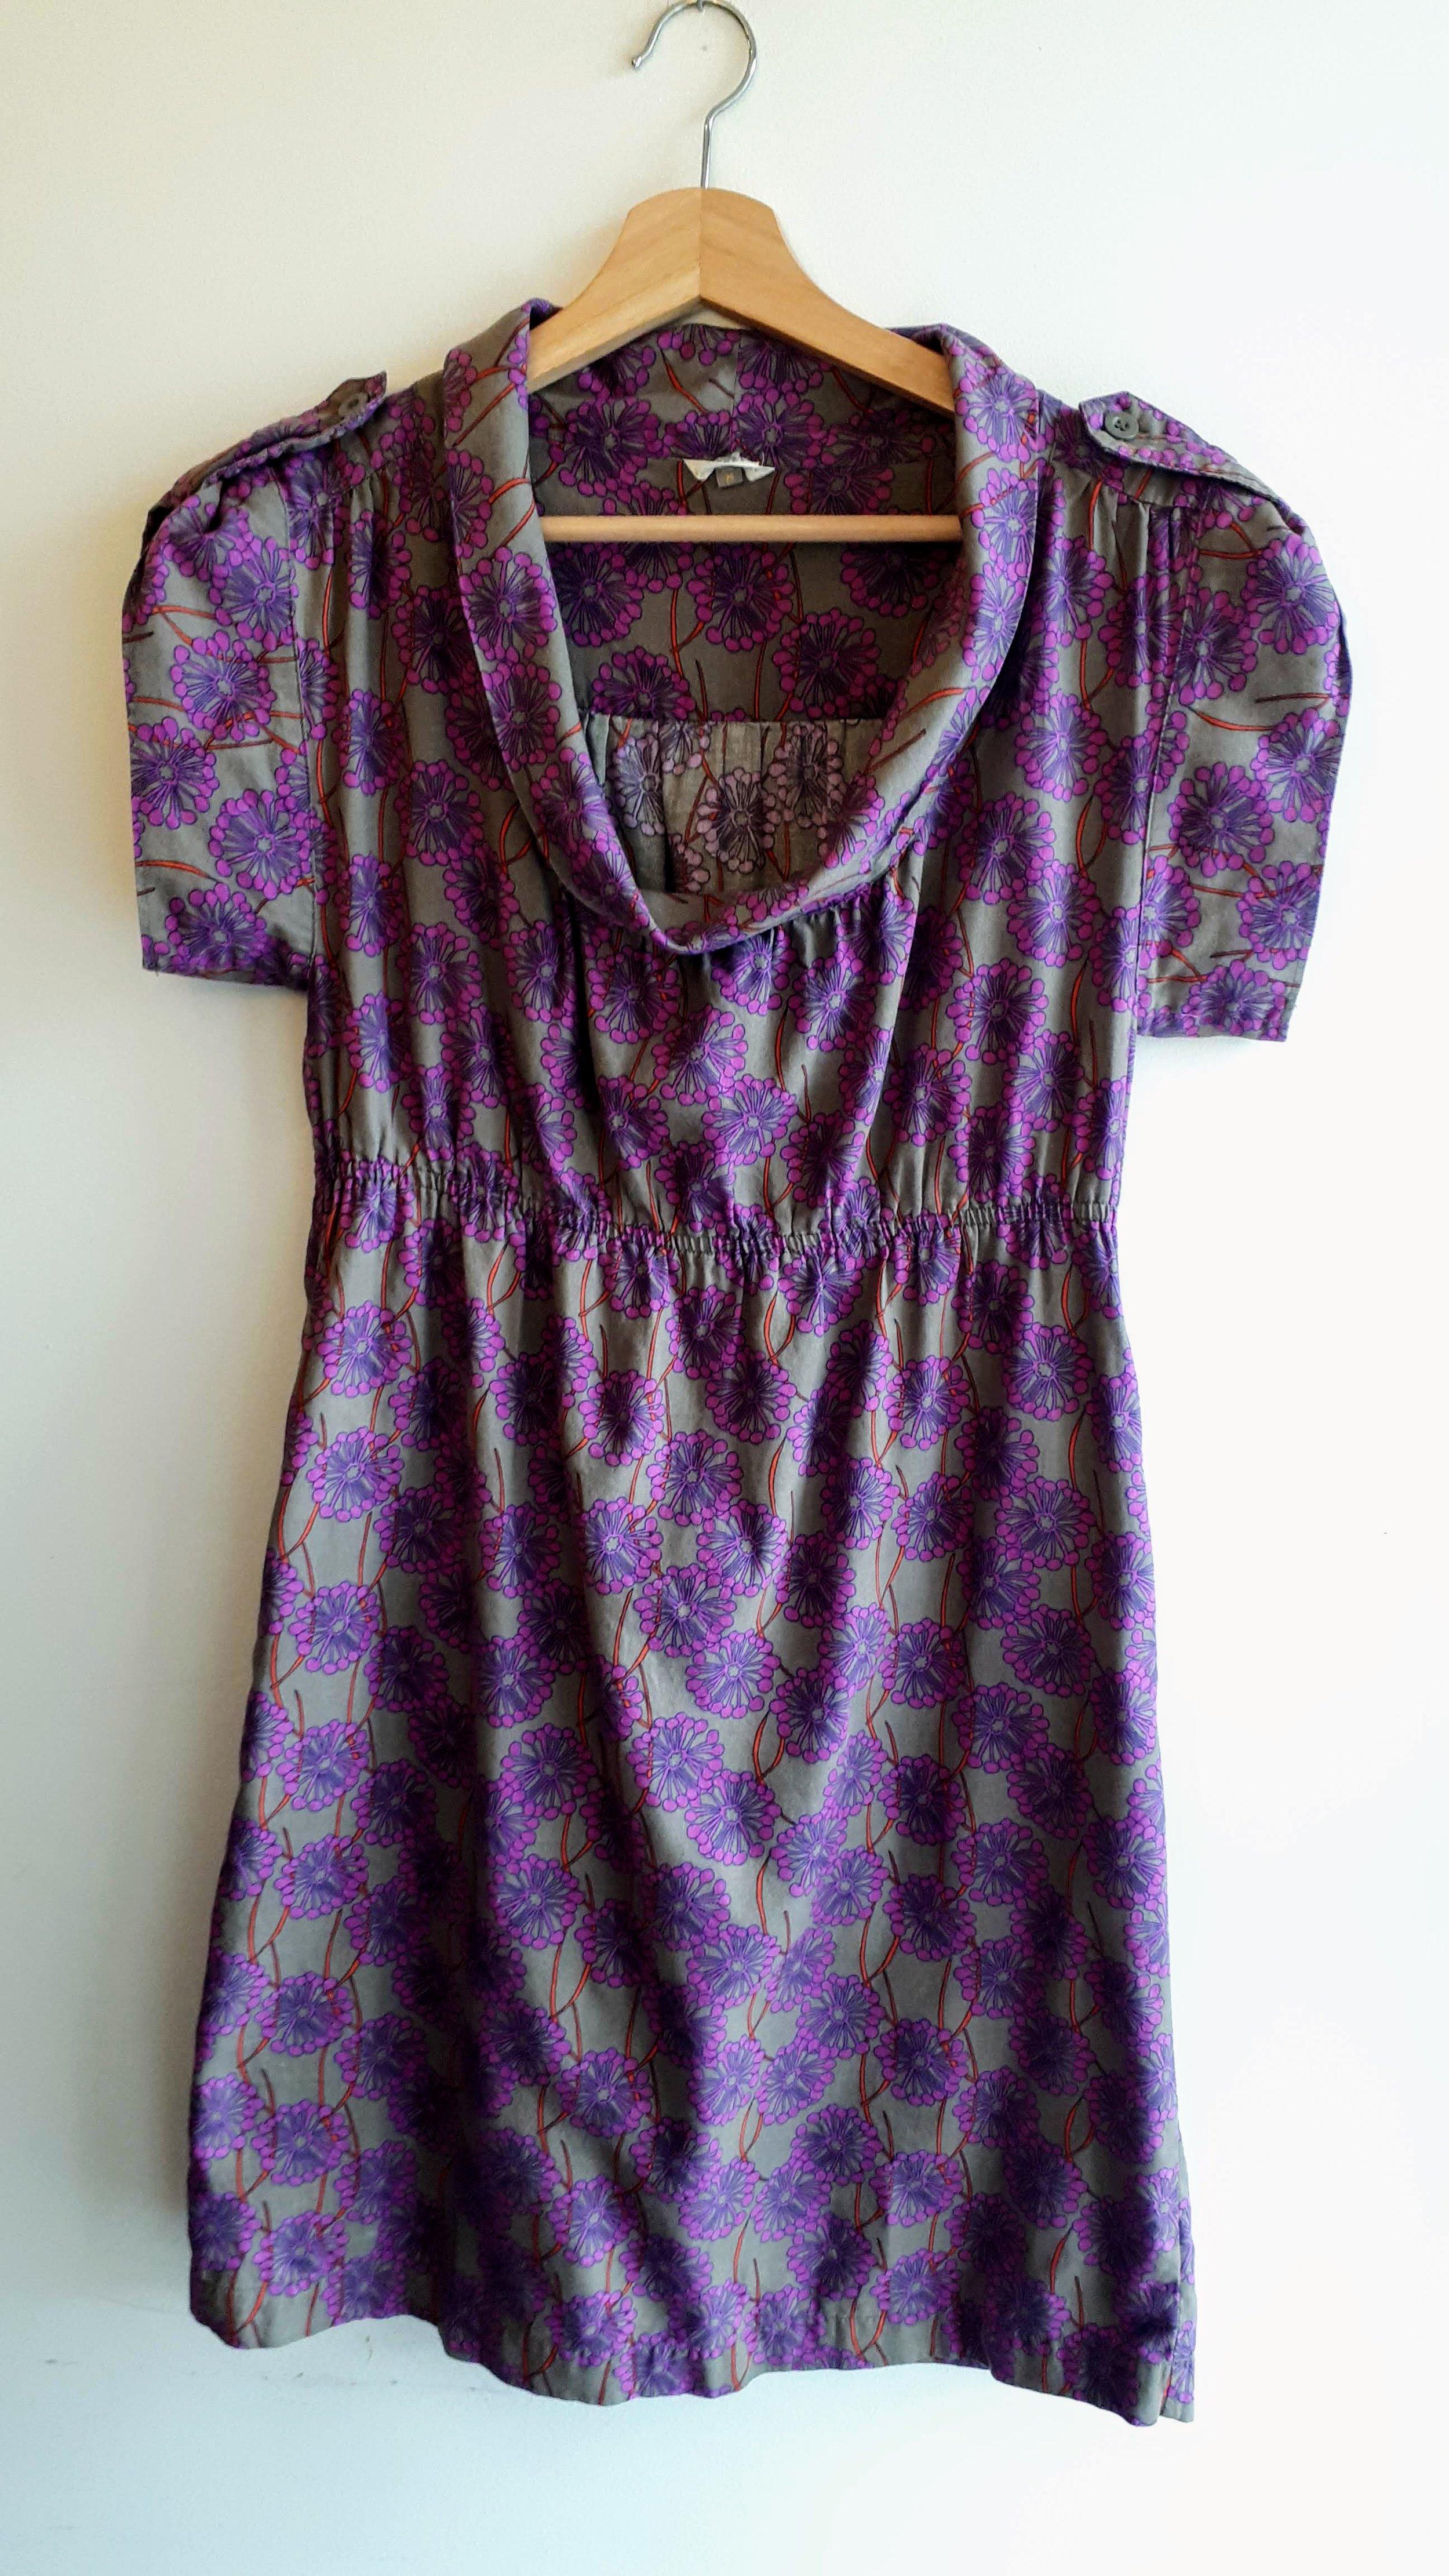 Fossil dress; Size M, $38